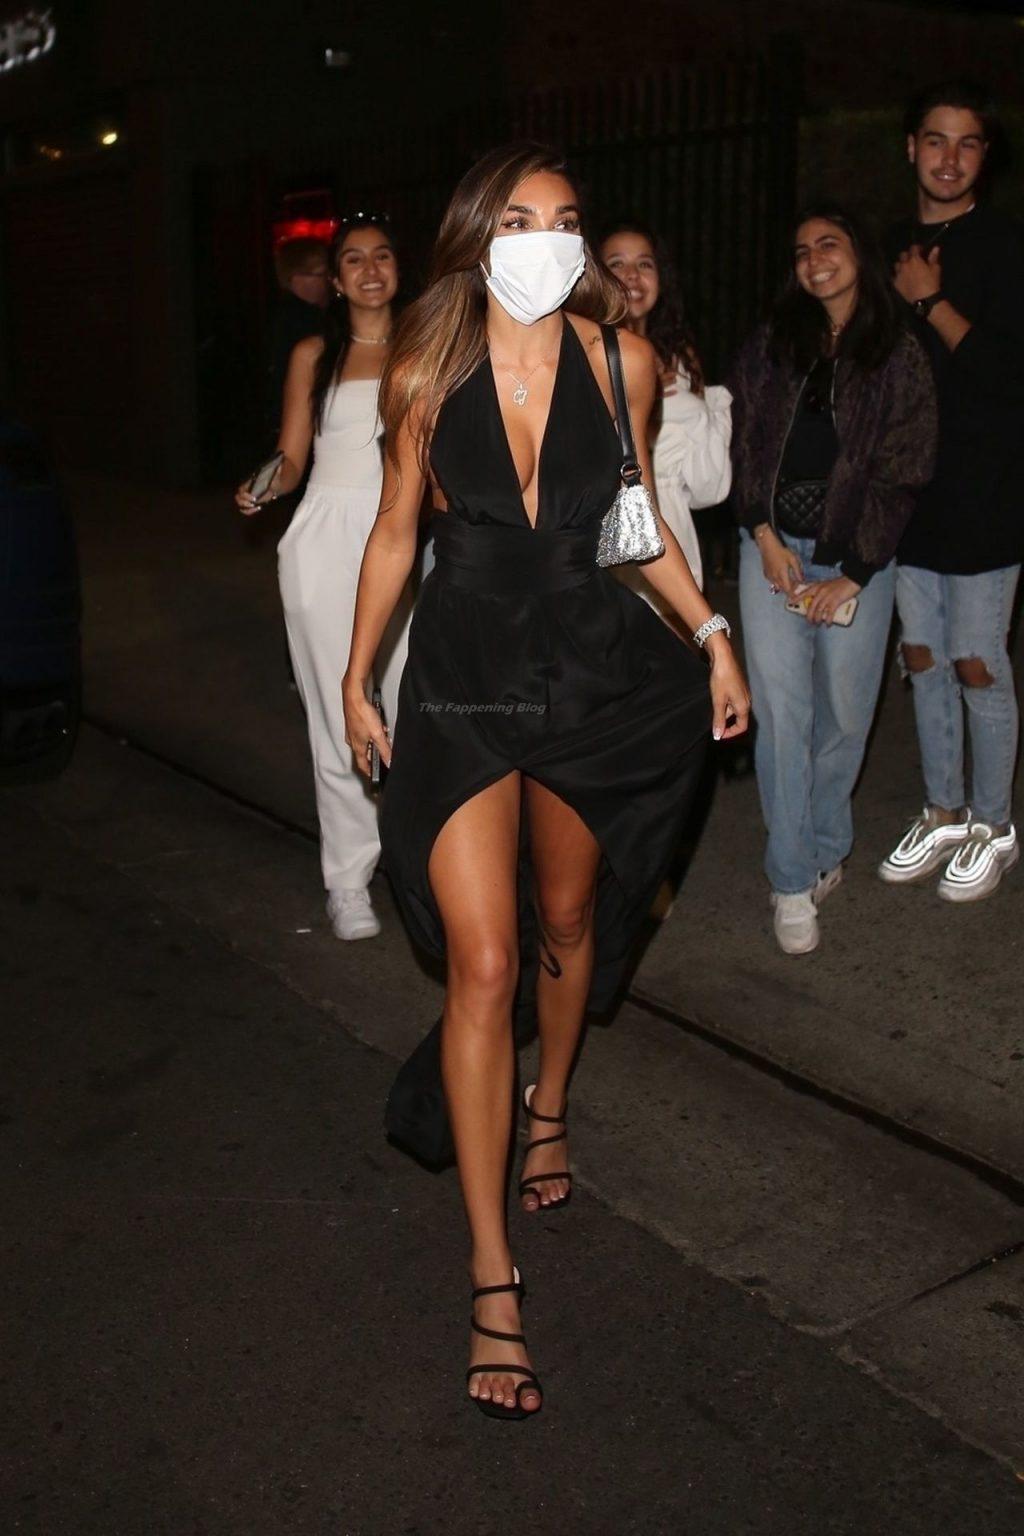 Chantel Jeffries Arrives at Goya Studios For a Party (76 Photos)